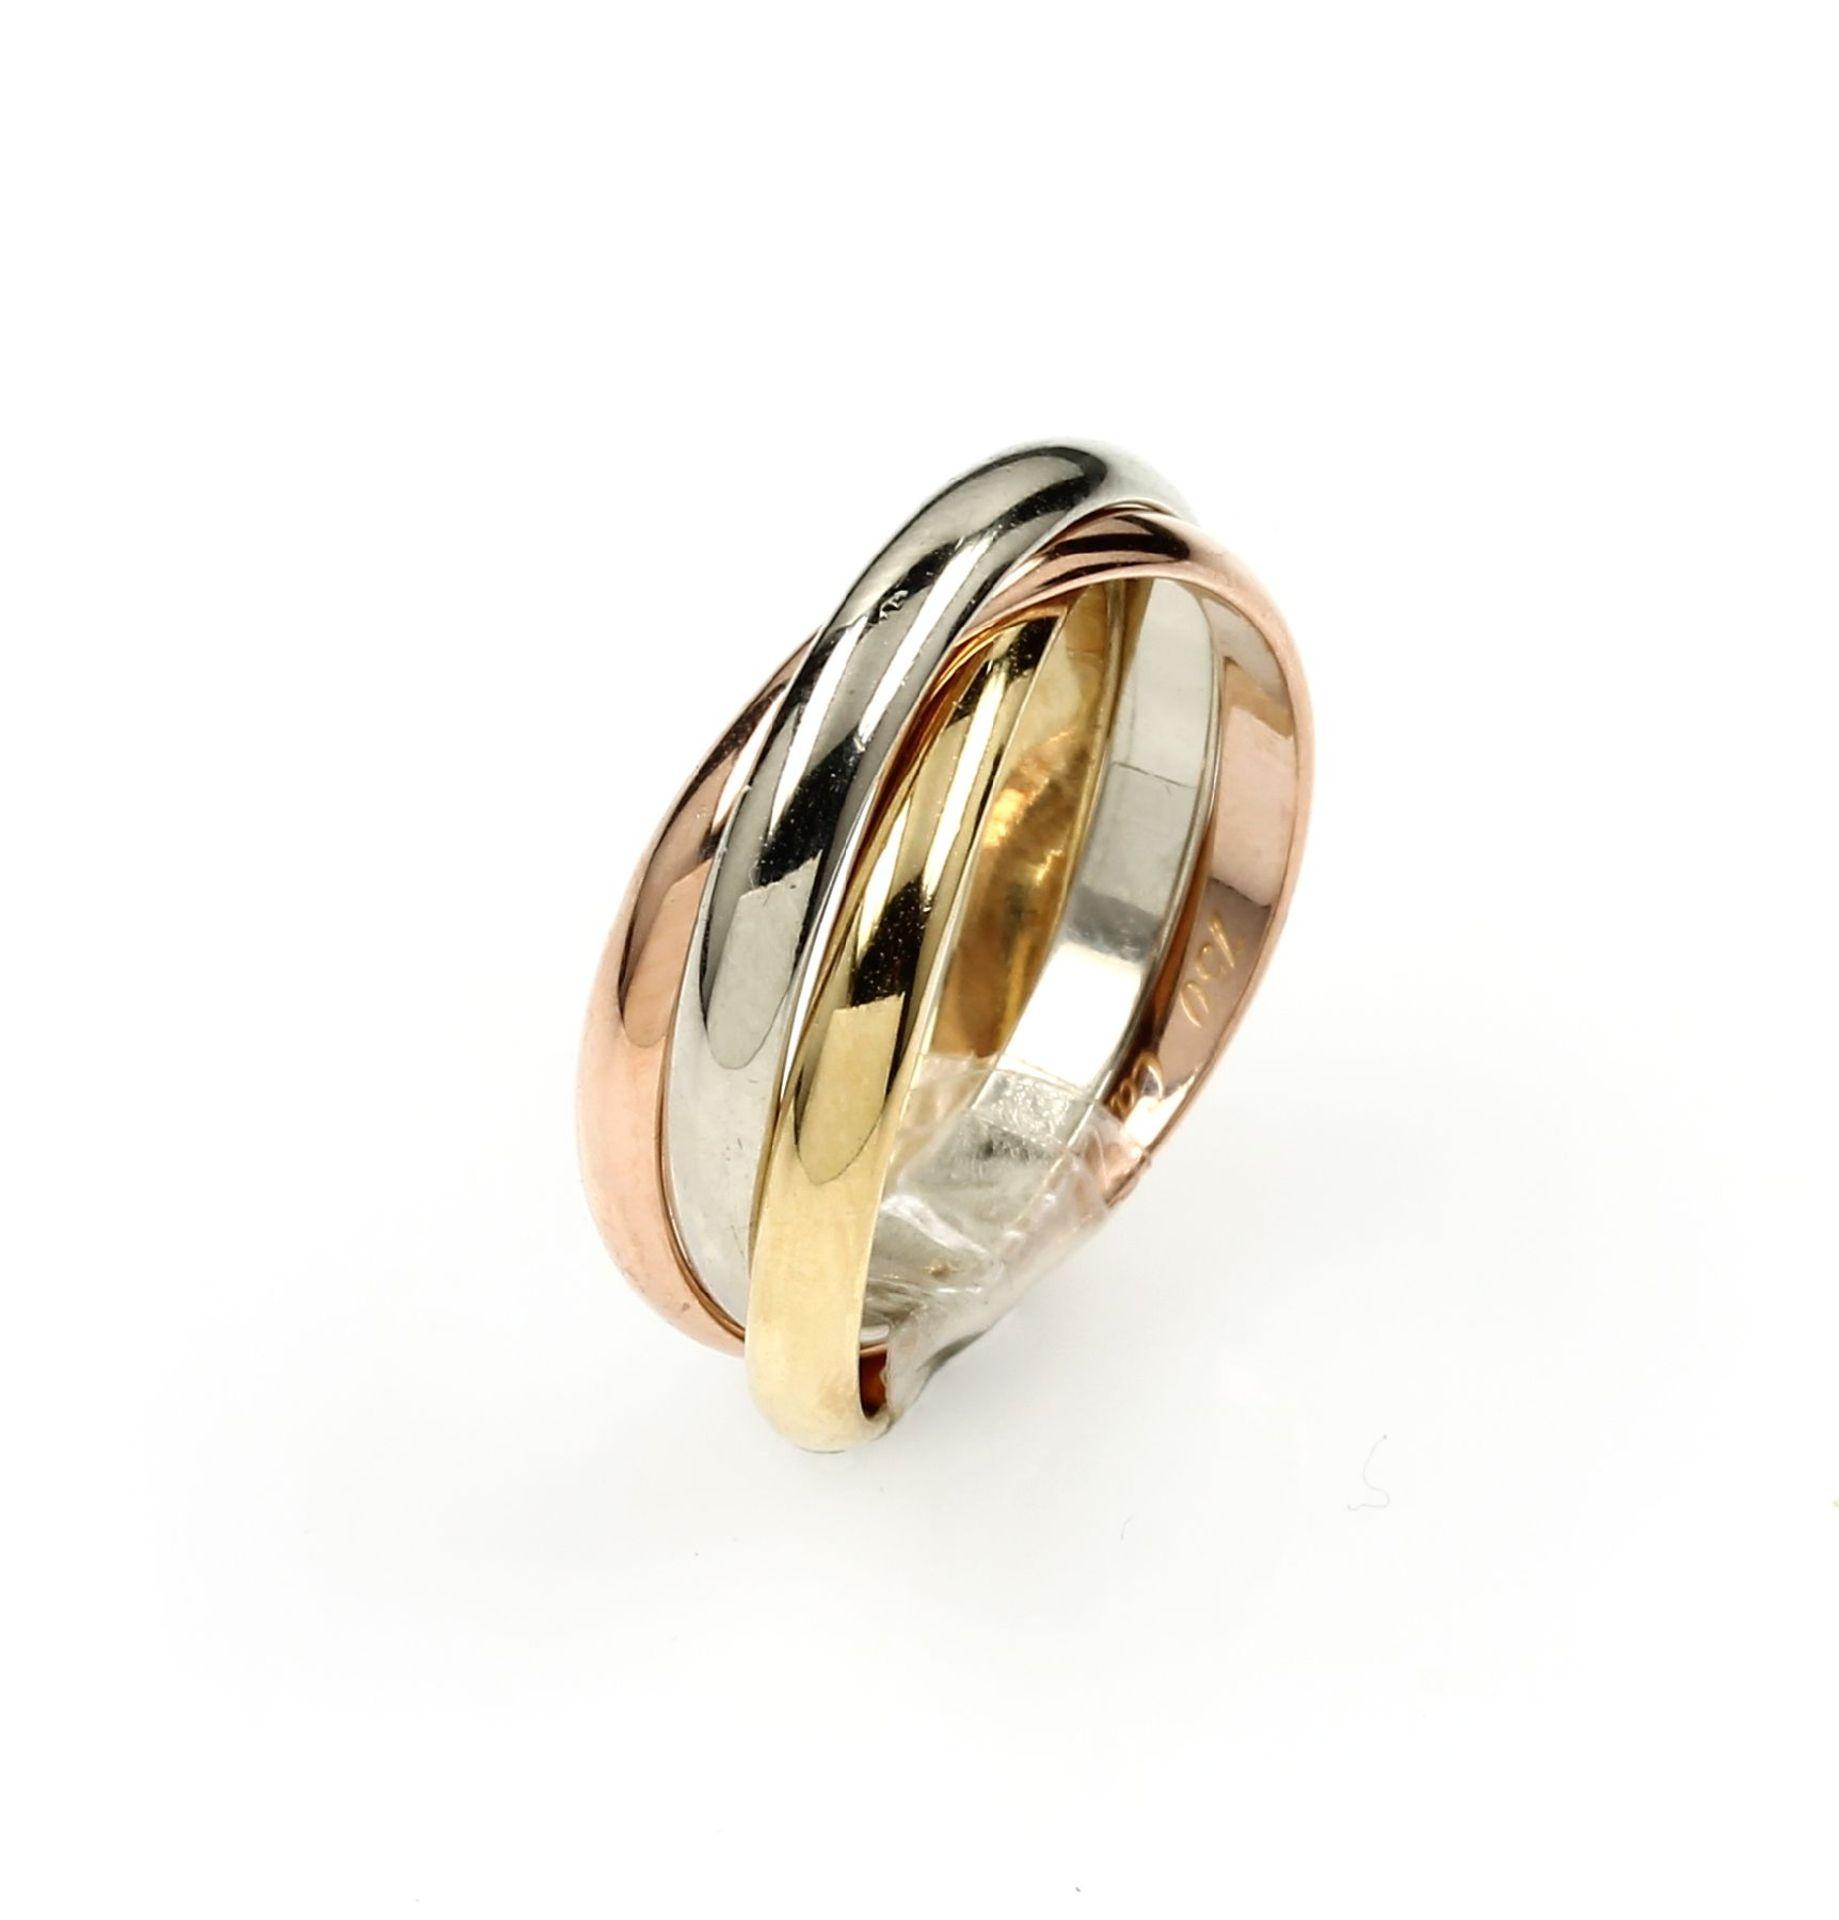 Los 61538 - 18 kt gold CARTIER Trinity ring , YG/WG/RoseG 750/000, classic Trinity design, ringsize 51, signed